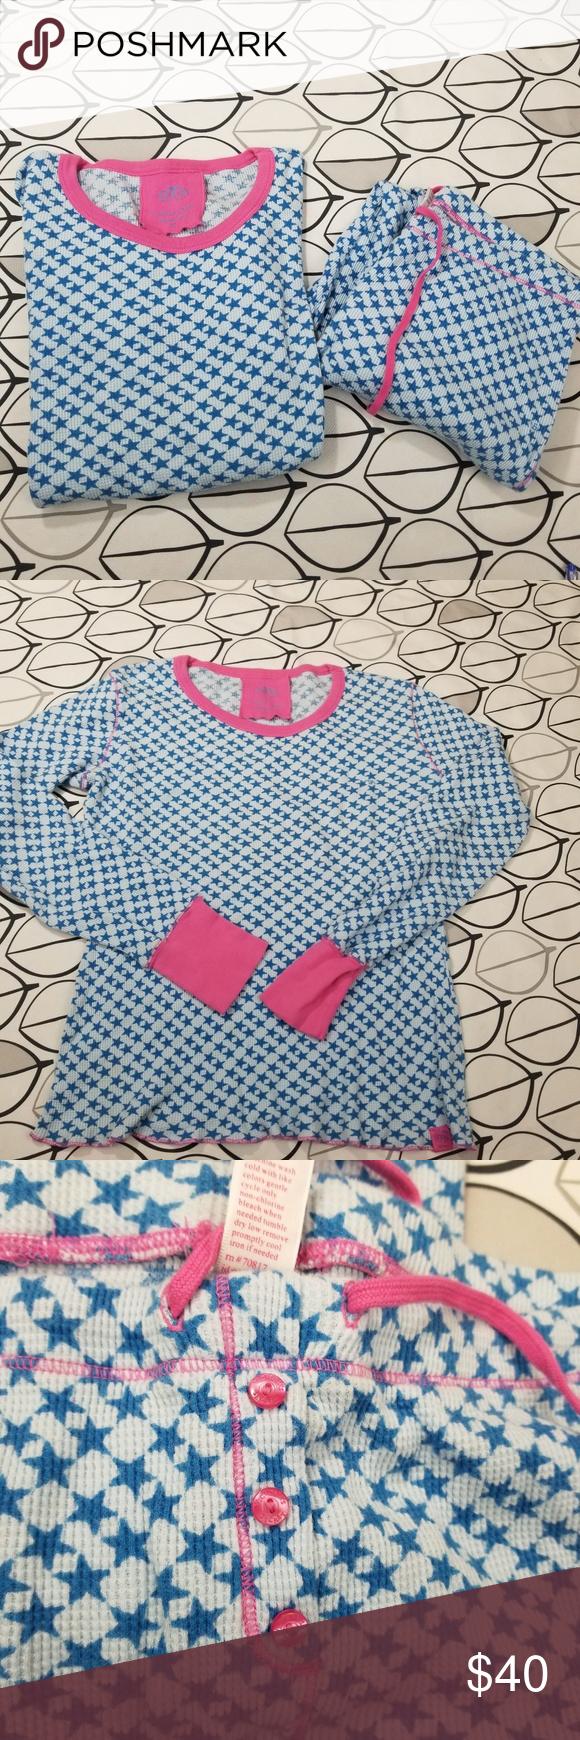 Victoria s Secret Blue Stars Thermal Pajamas Set Victoria s Secret thermal  pajamas sleep set. Size M 63df148d8